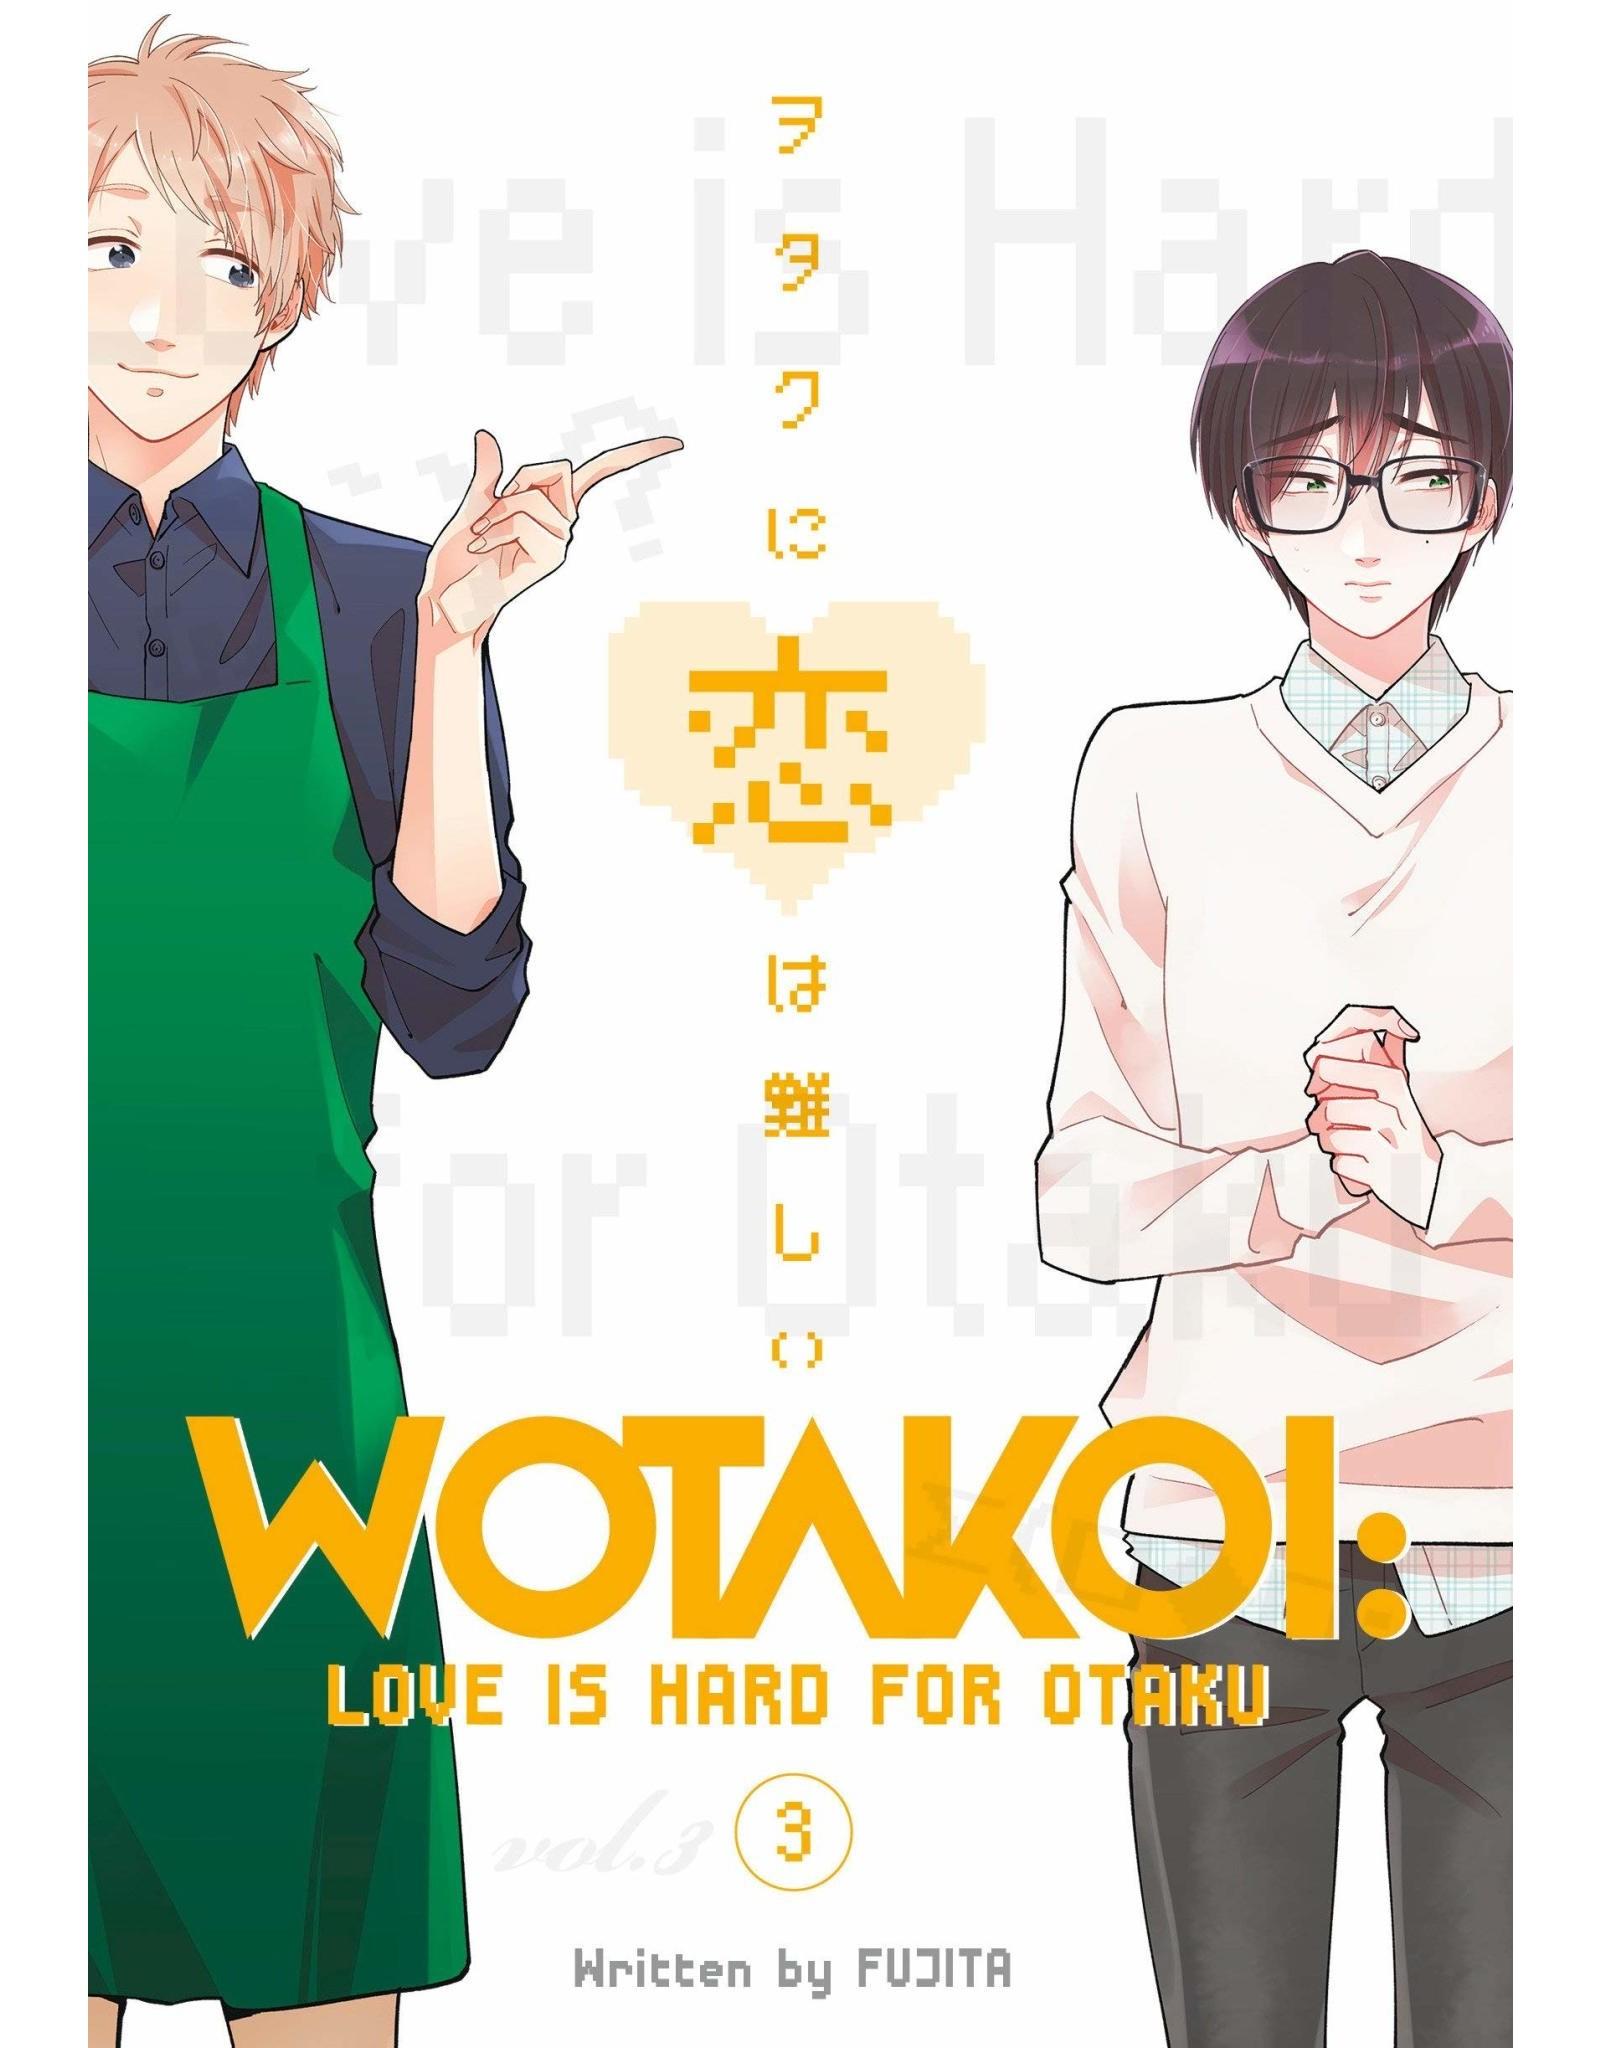 Wotakoi: Love is Hard for Otaku 3 (English)